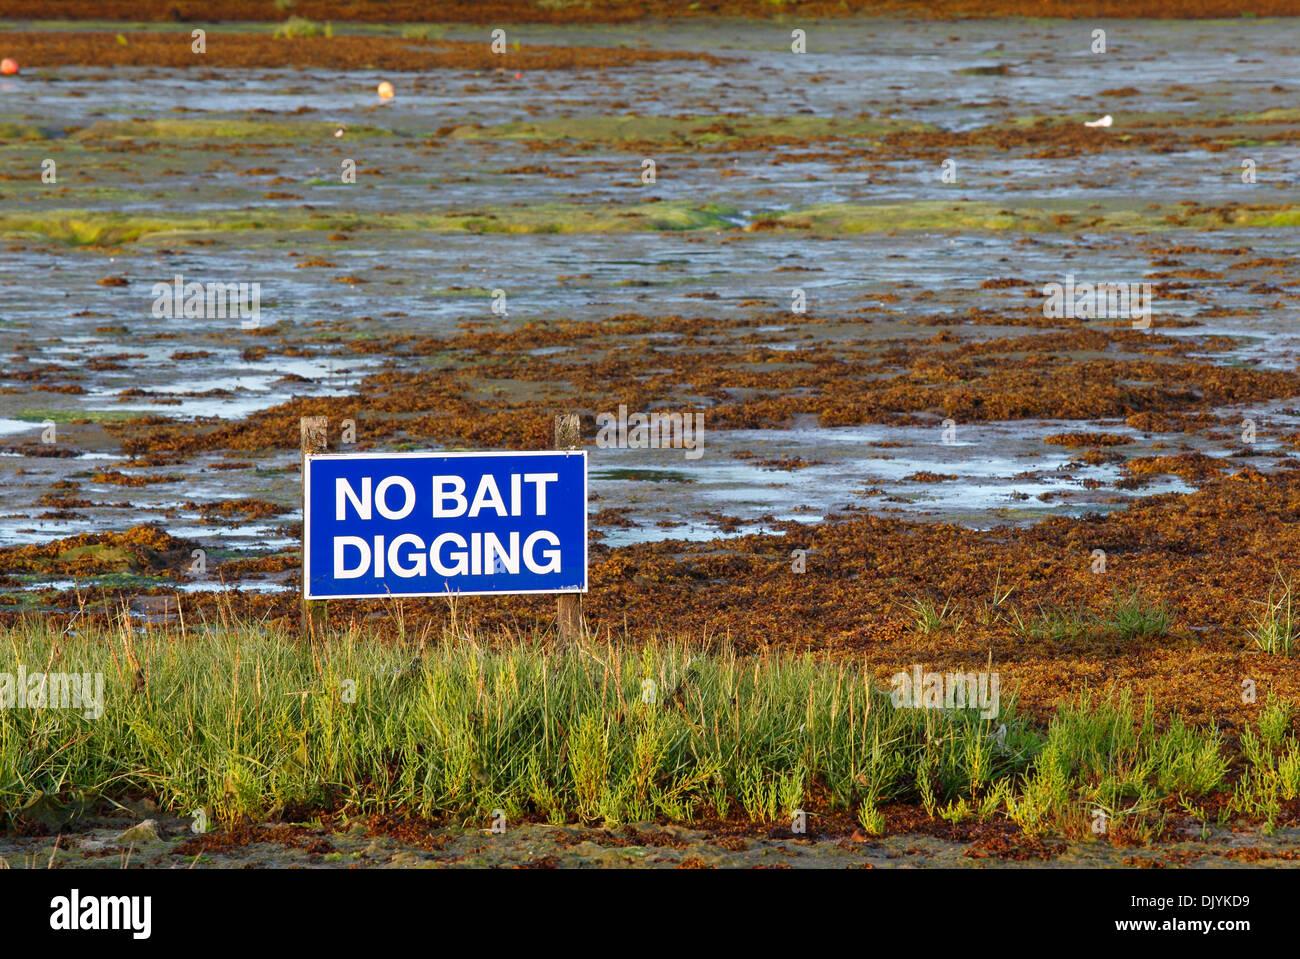 no-bait-digging-sign-river-yar-estuary-yarmouth-isle-of-wight-hampshire-DJYKD9.jpg